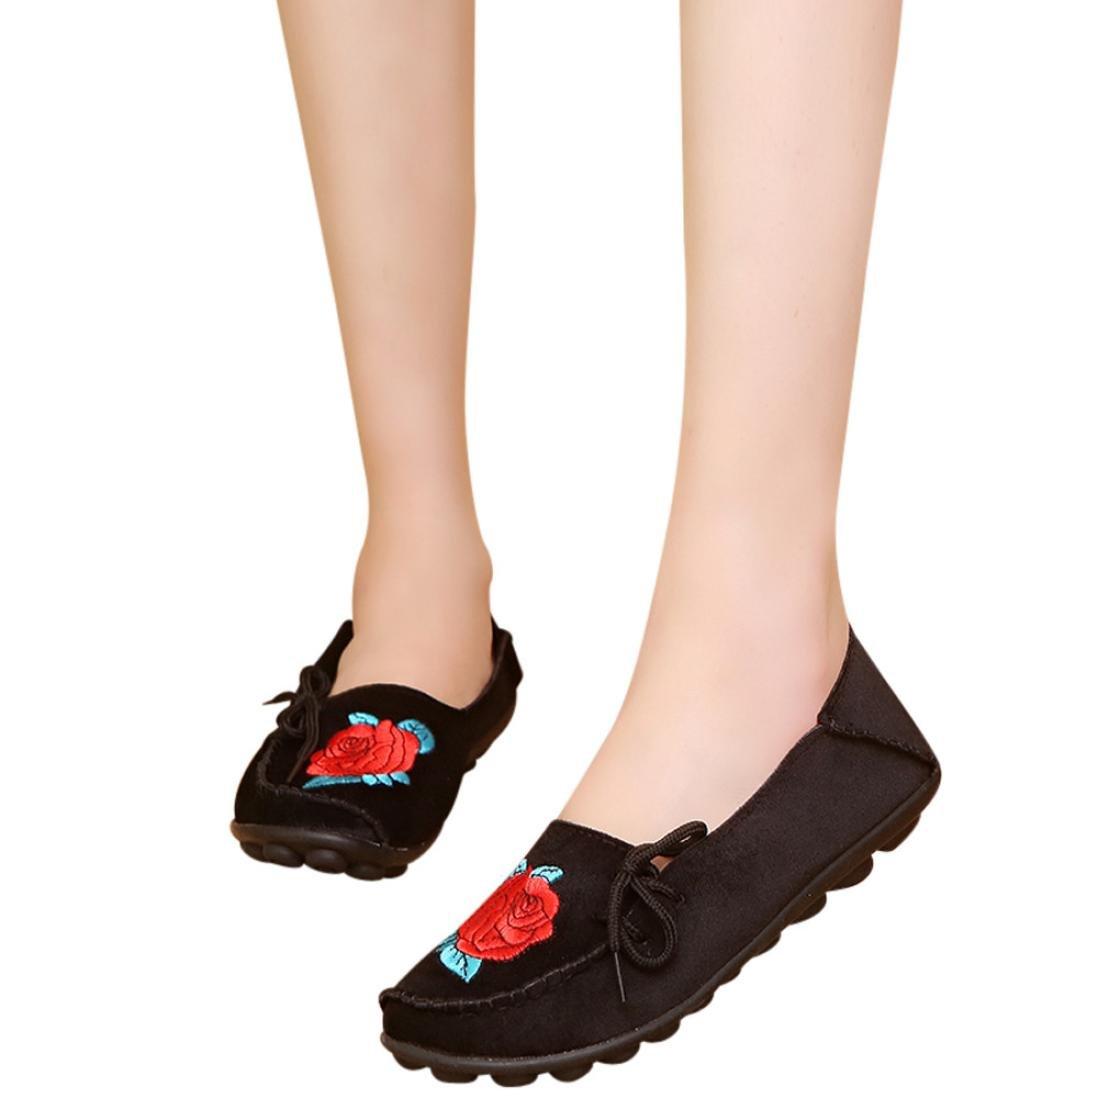 yjydada女性用フラットシューズ刺繍ソフトボトム靴柔らかいスリップオンカジュアルボートシューズ B07CP65YCK 37|ブラック ブラック 37